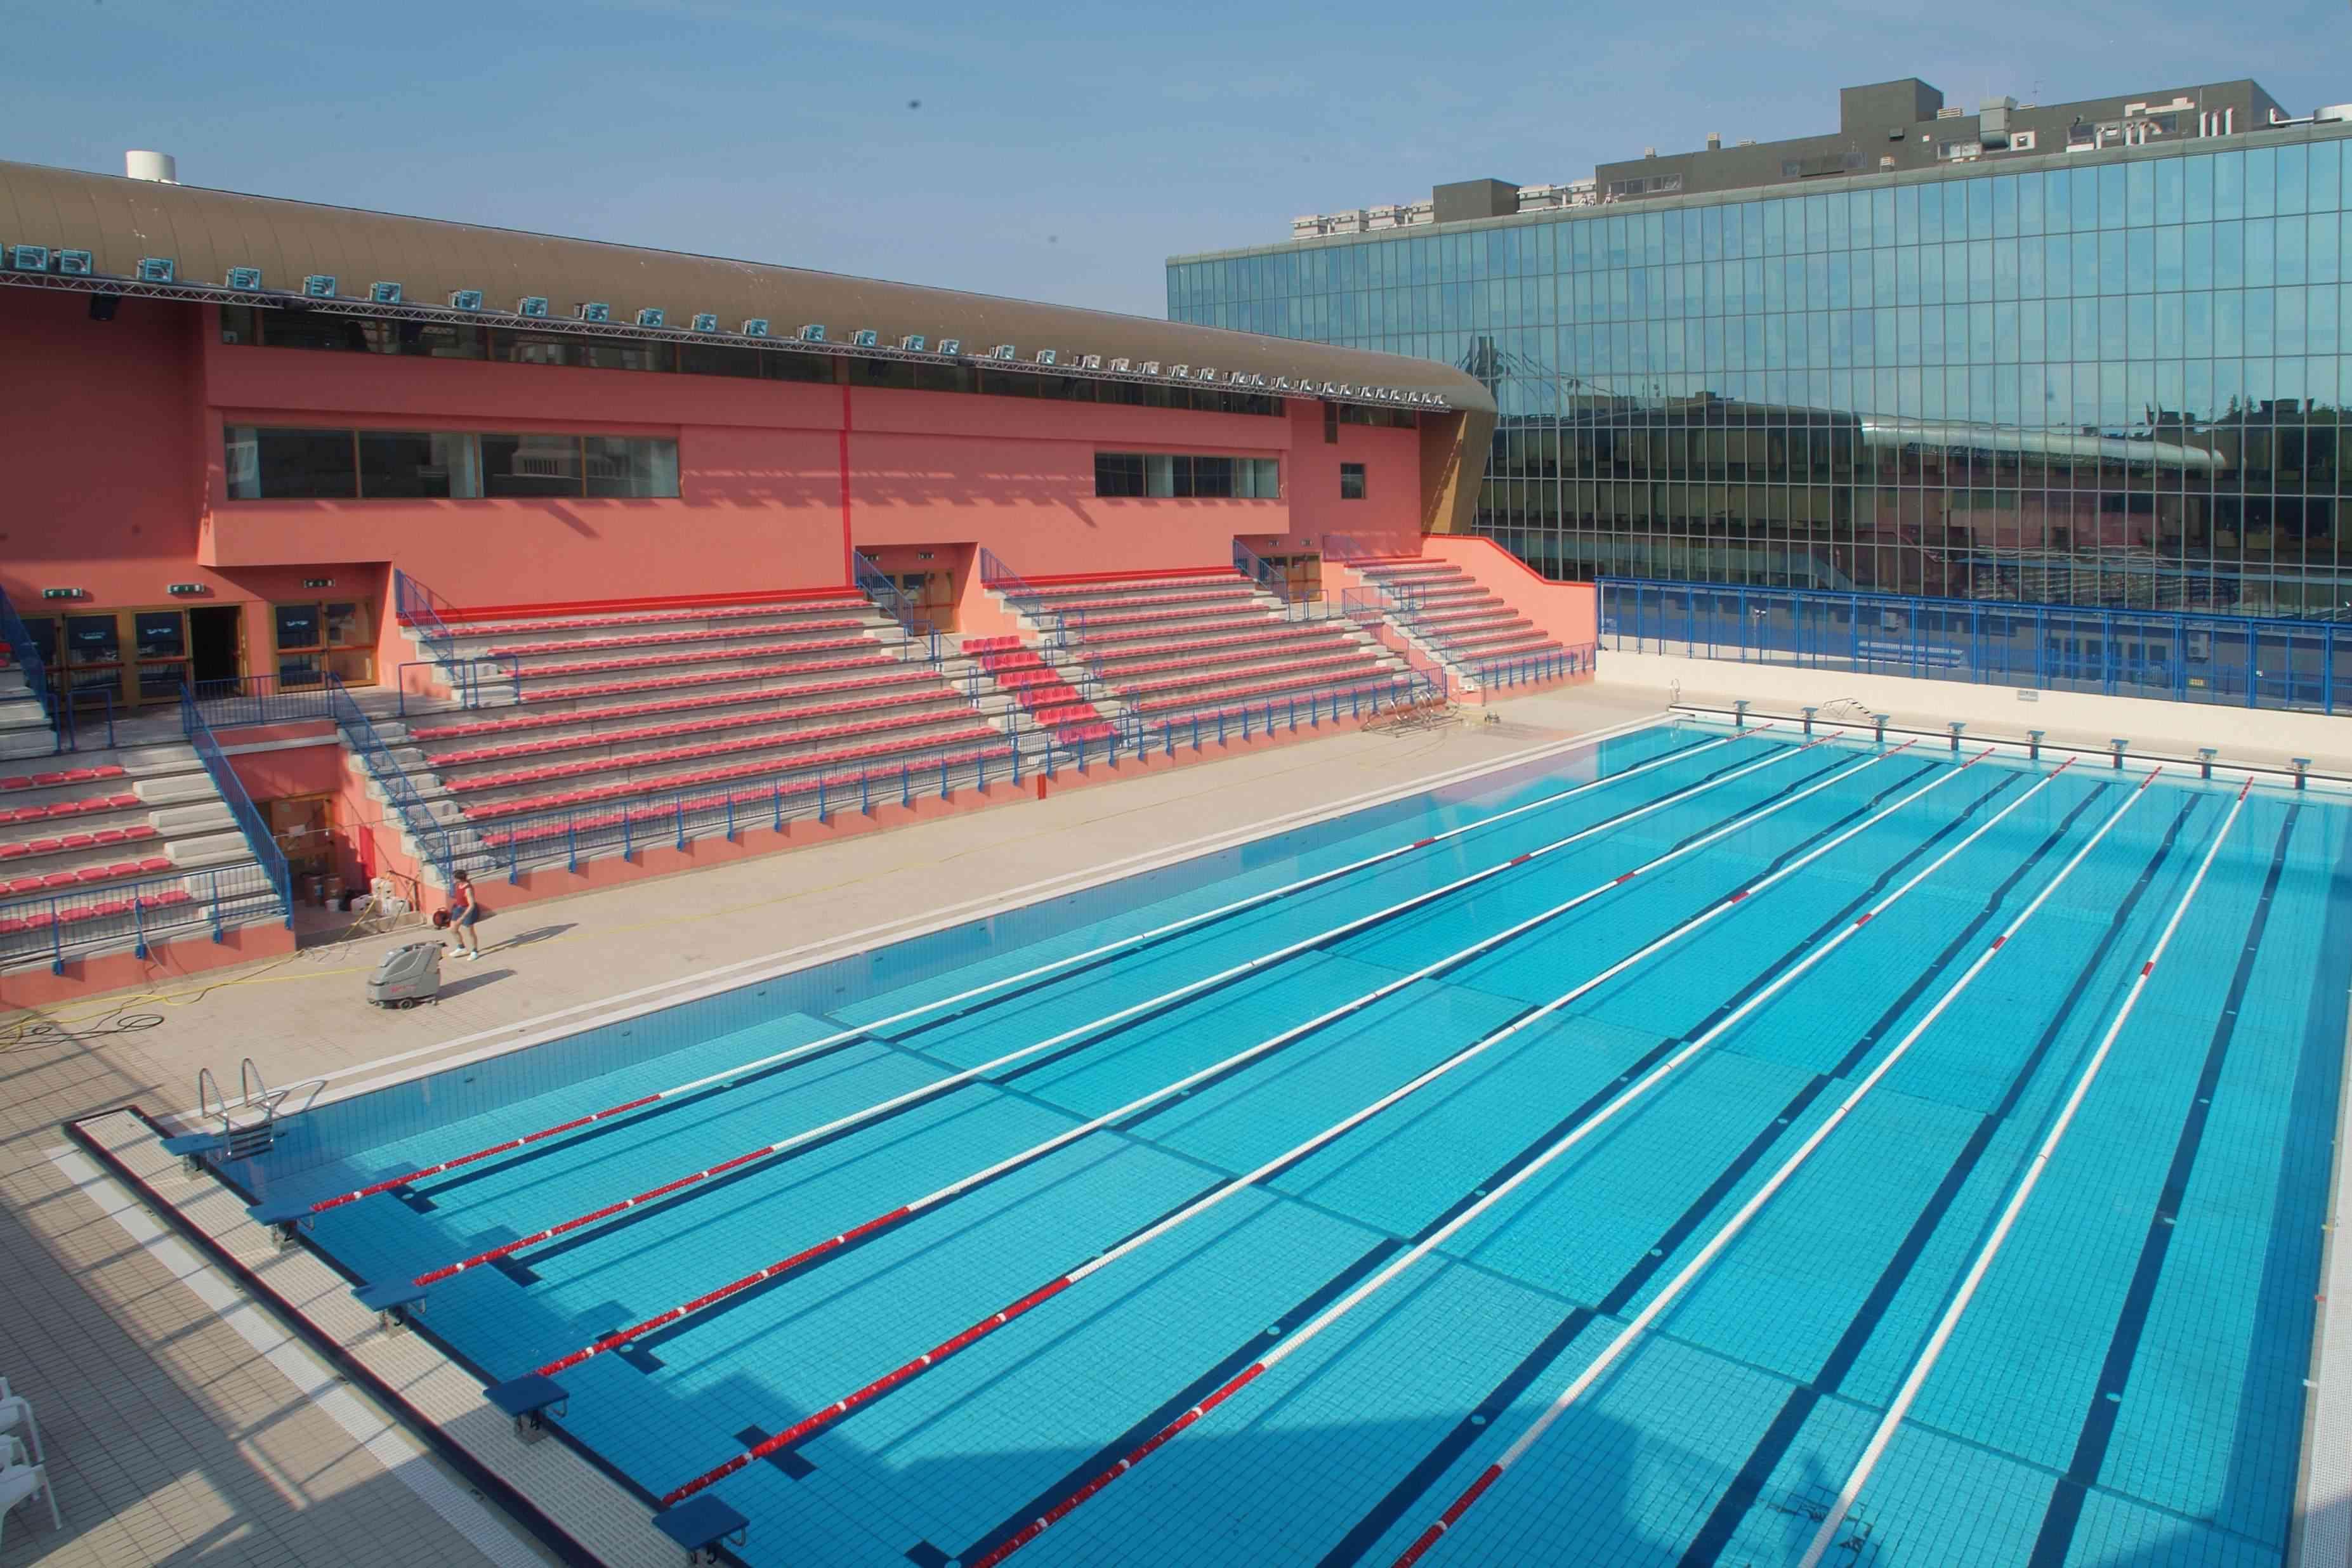 Prezzi e orari piscina scoperta piscina bianchi trieste - Piscine roma nord ...